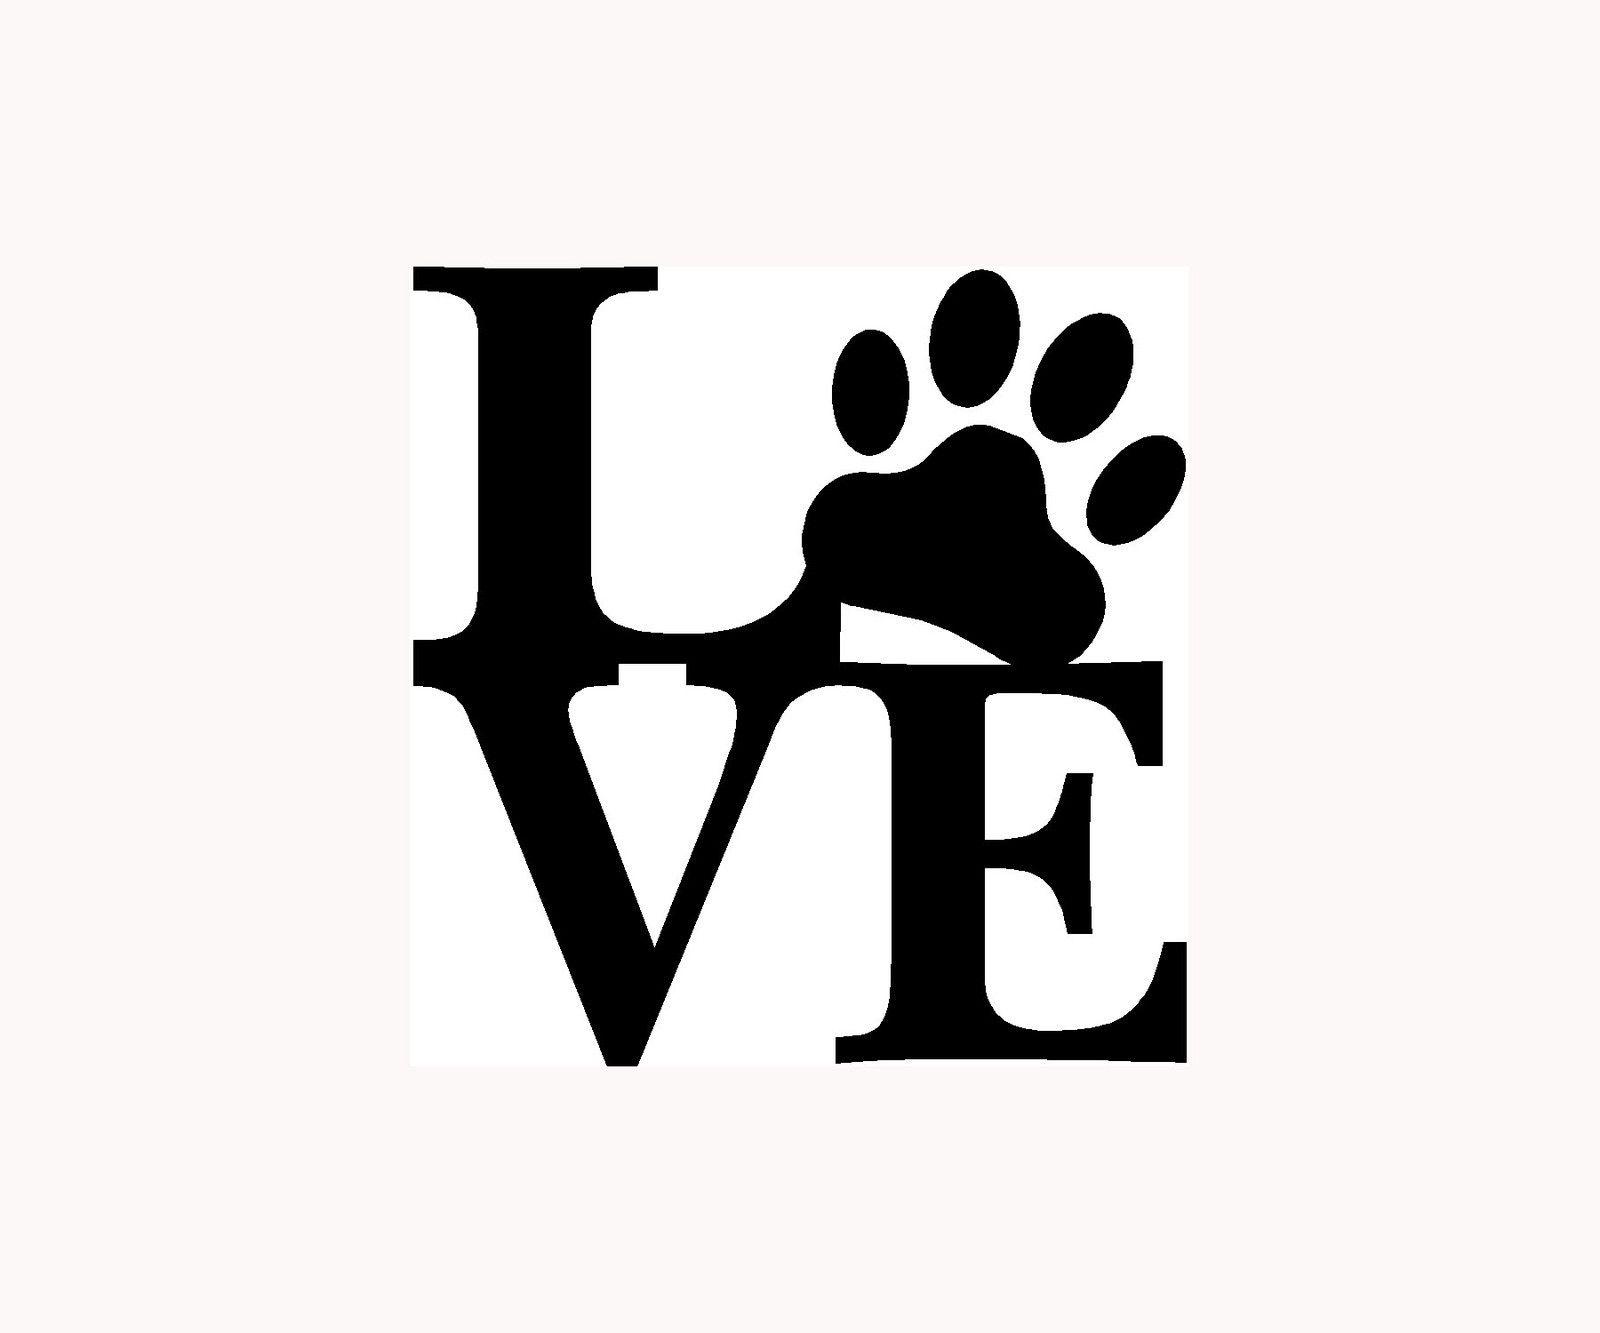 Details about love paw sticker family car window vinyl